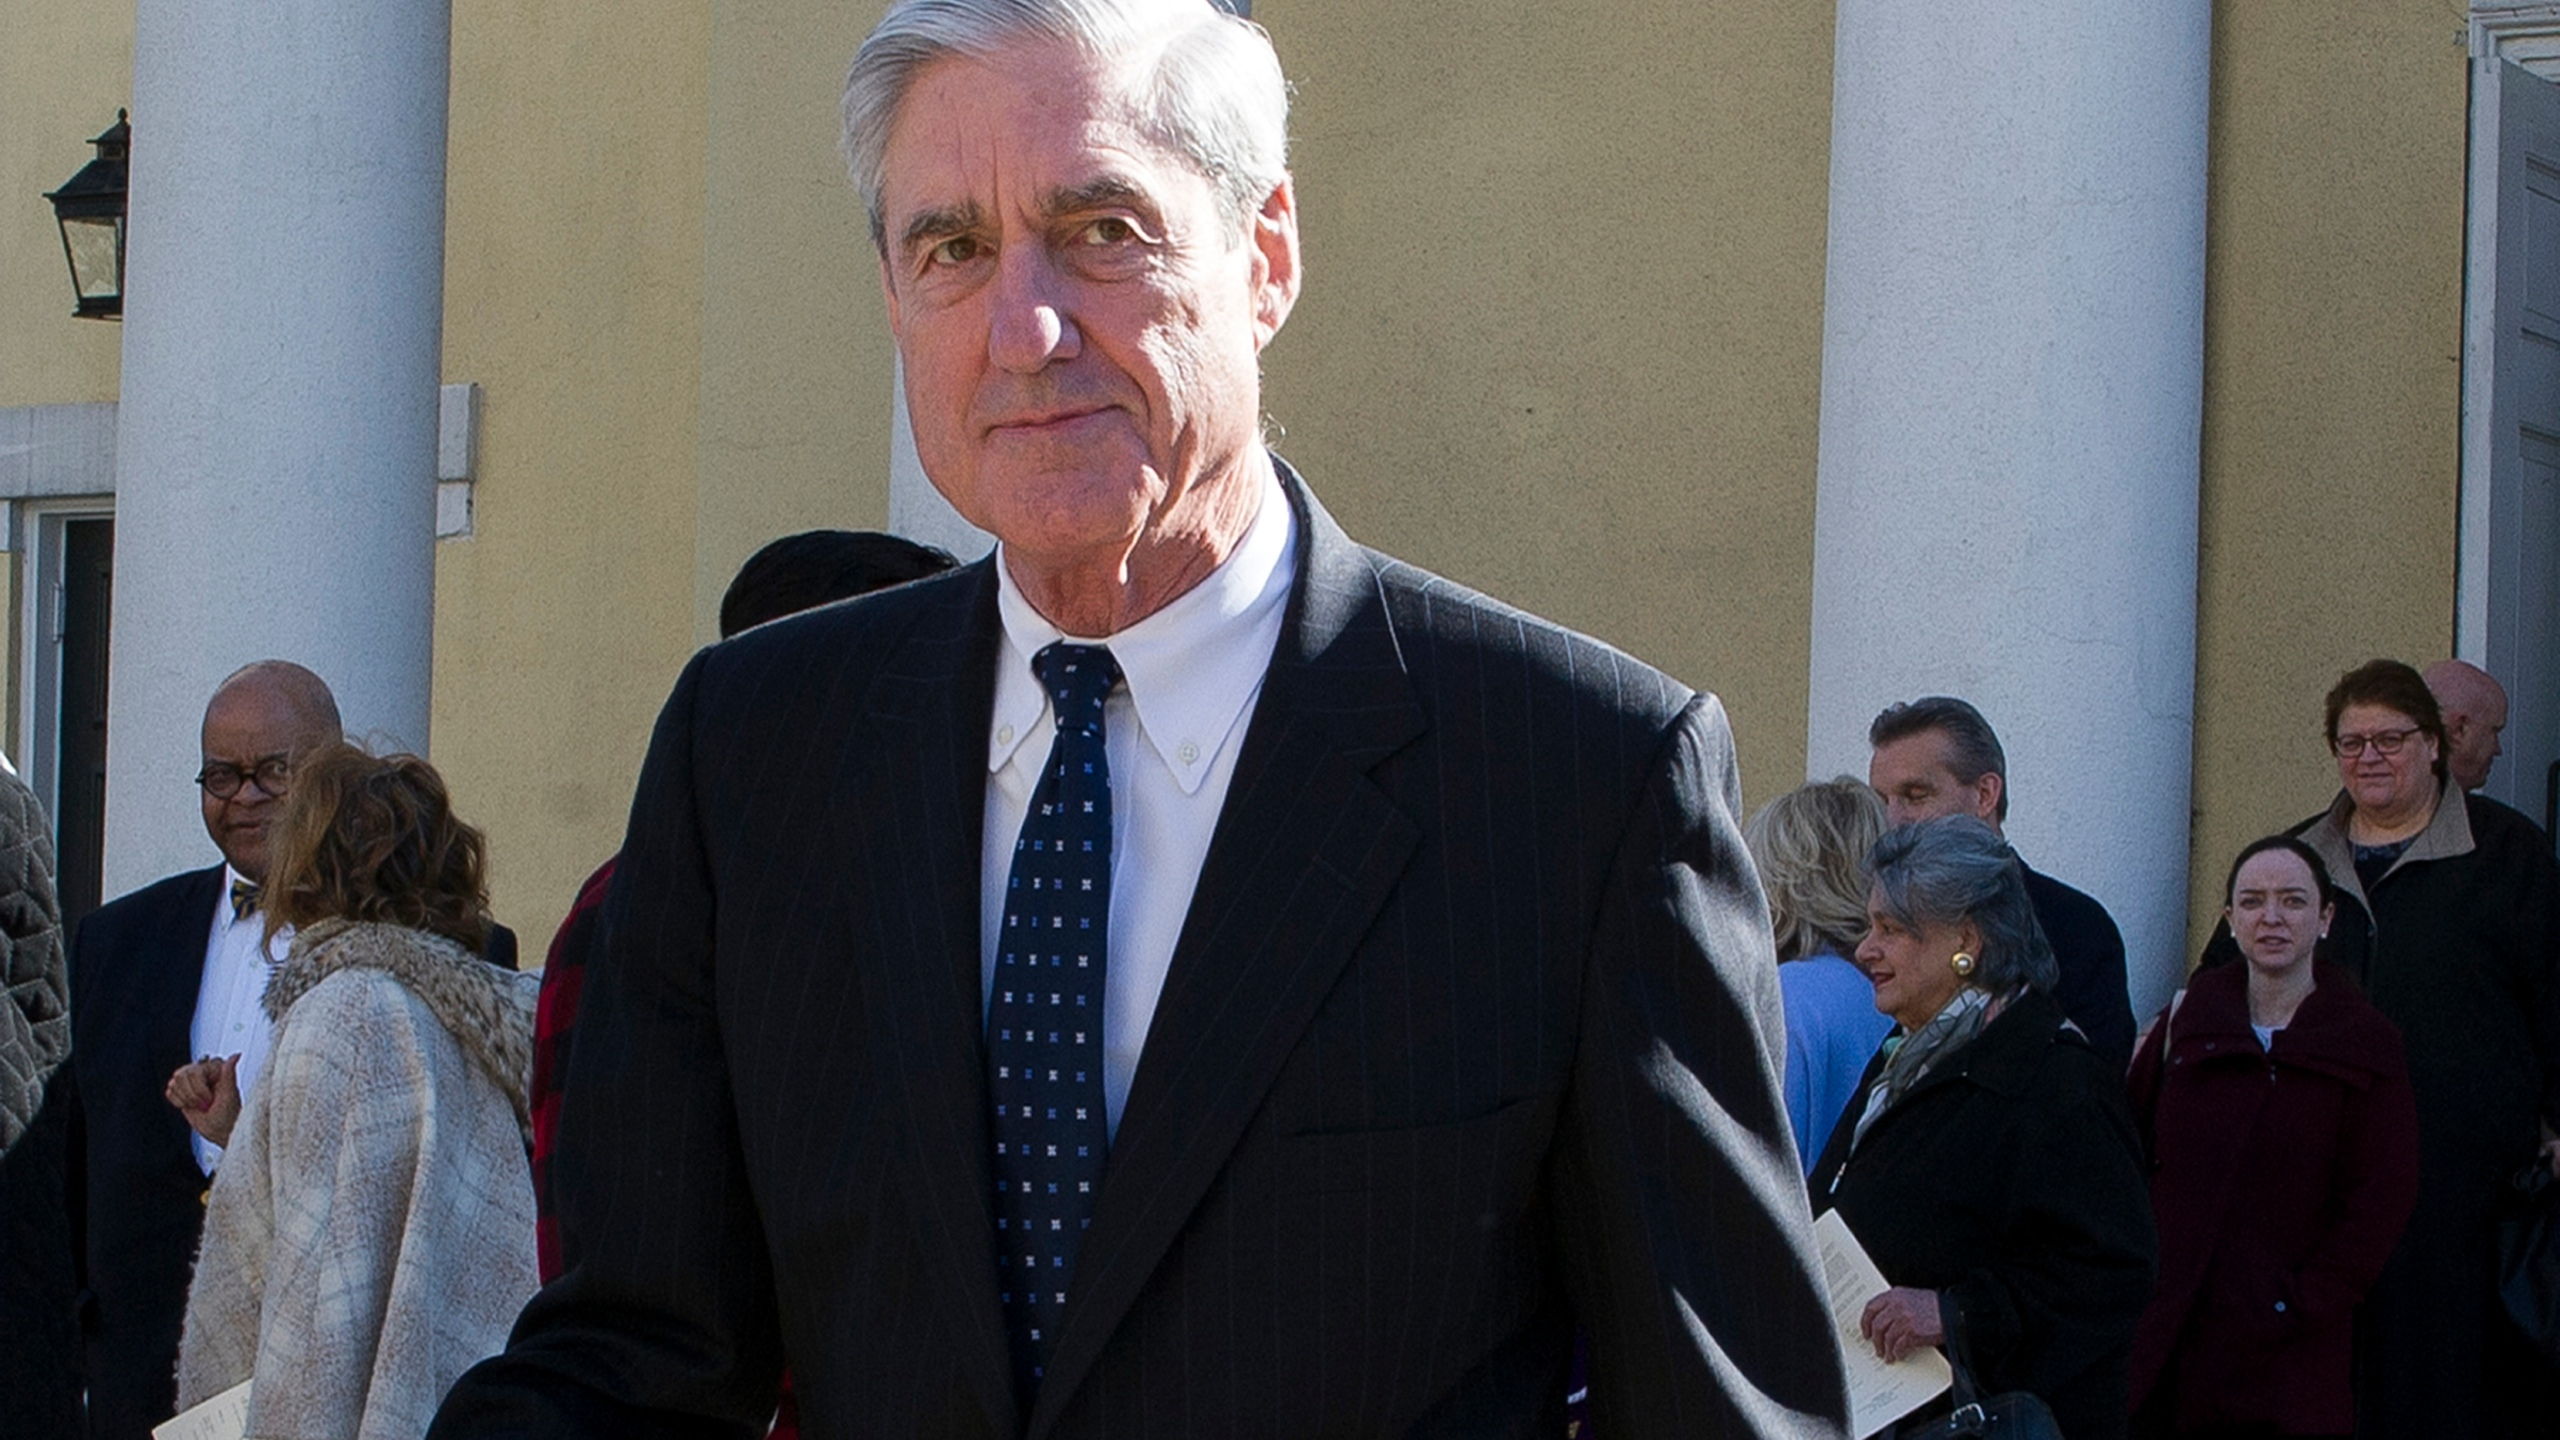 Trump_Russia_Probe_Mueller_50210-159532.jpg43165404